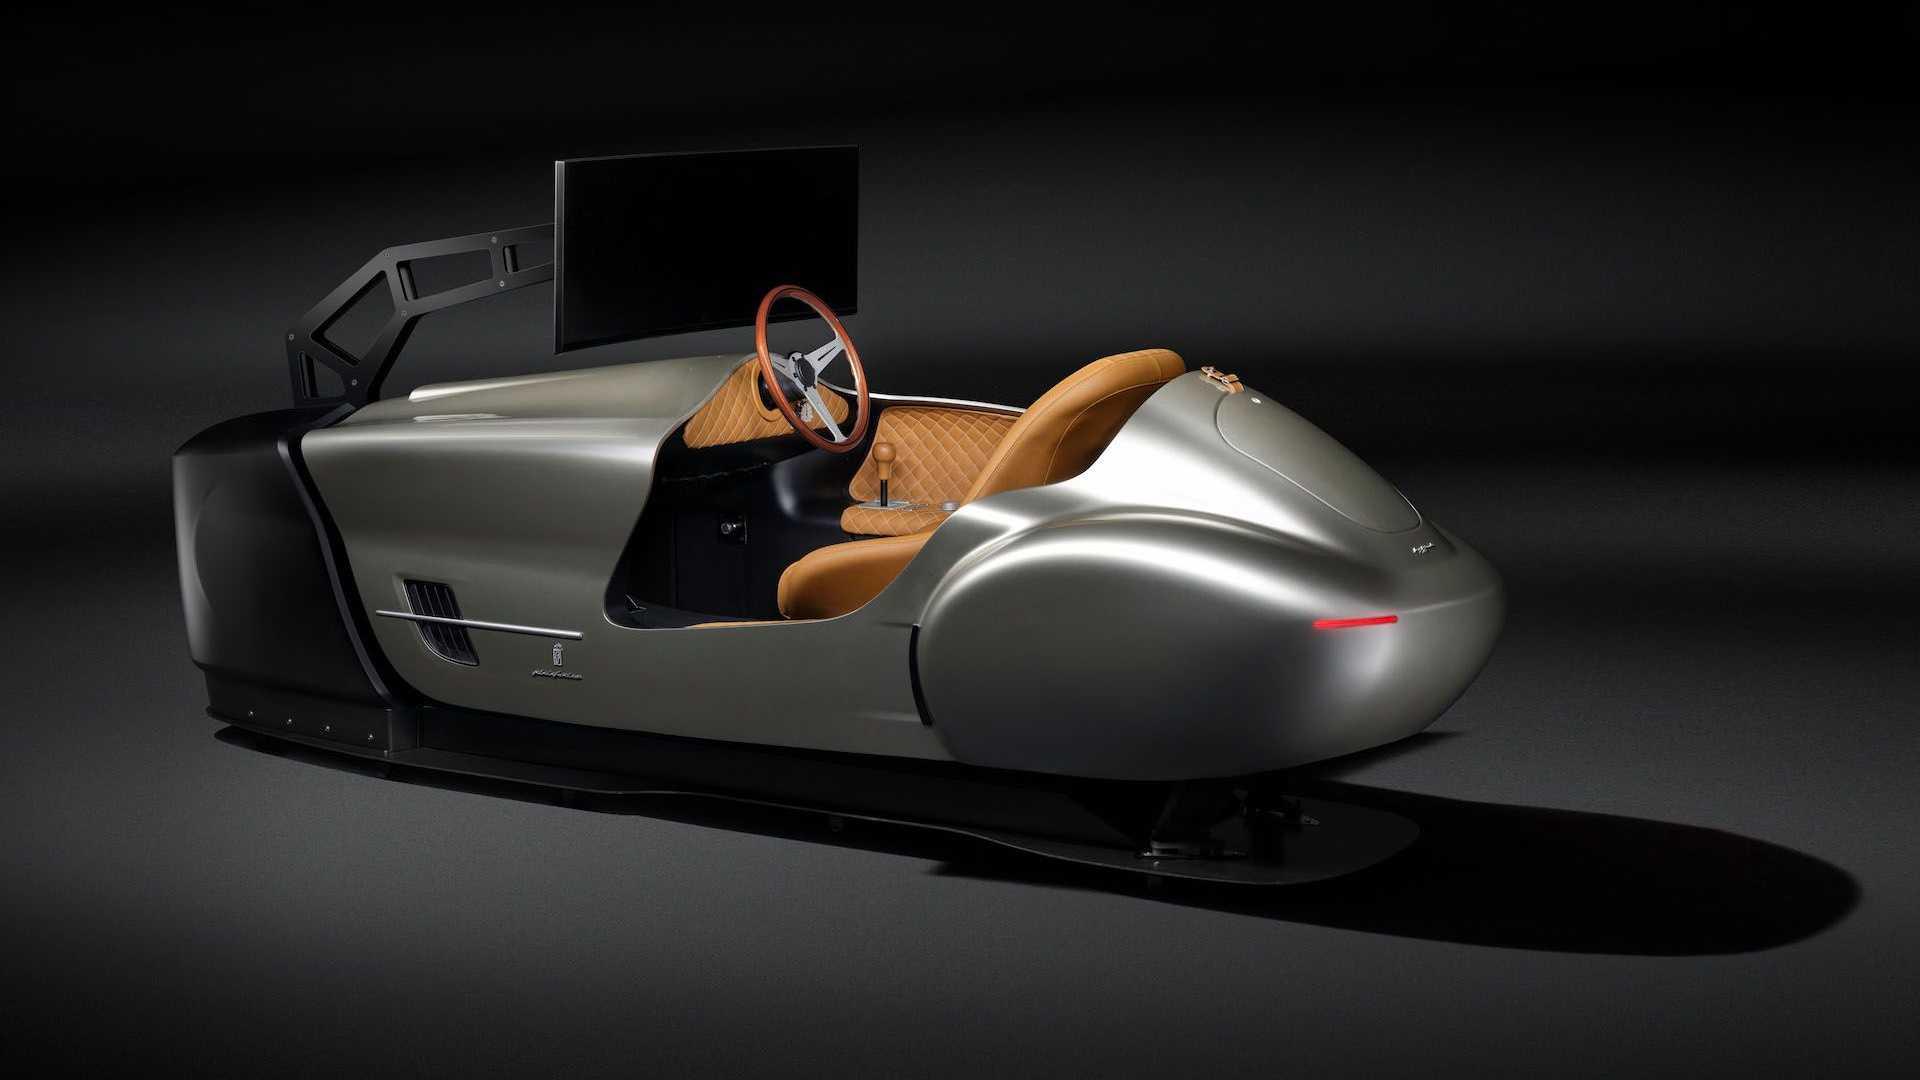 pininfarina-leggenda-eclassic-simulator-for-sale.jpg